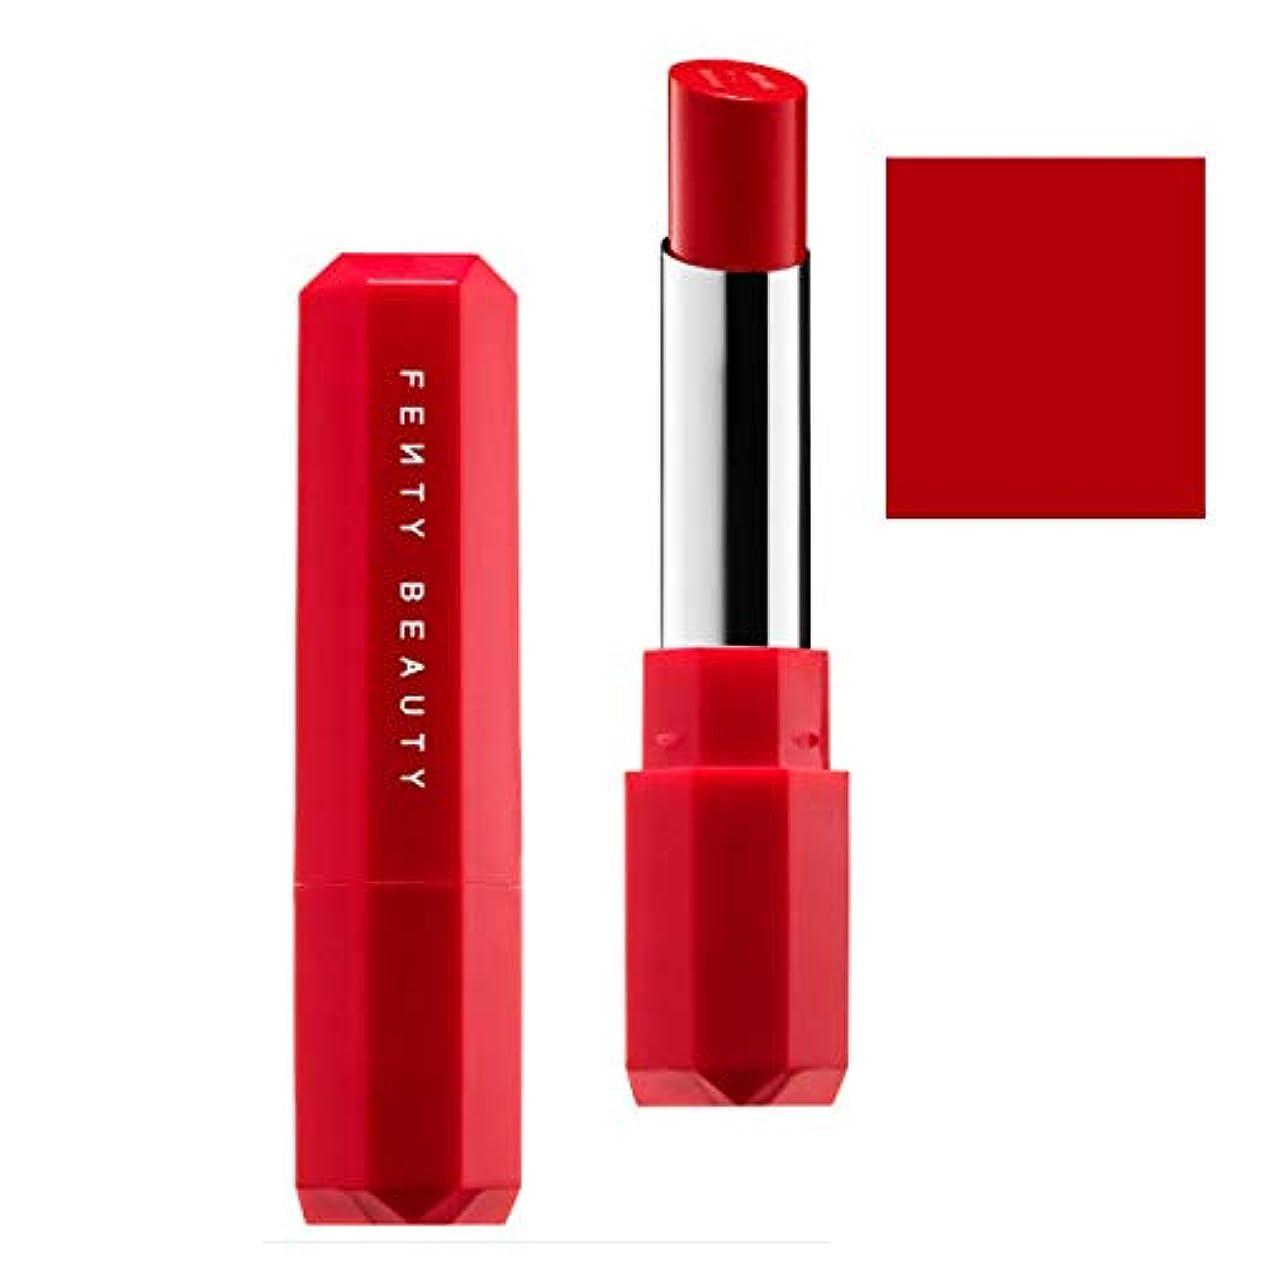 速報下手哲学博士FENTY BEAUTY BY RIHANNA,New!!, 限定版 limited-edition, Poutsicle Juicy Satin Lipstick - Hot Blooded [海外直送品] [並行輸入品]